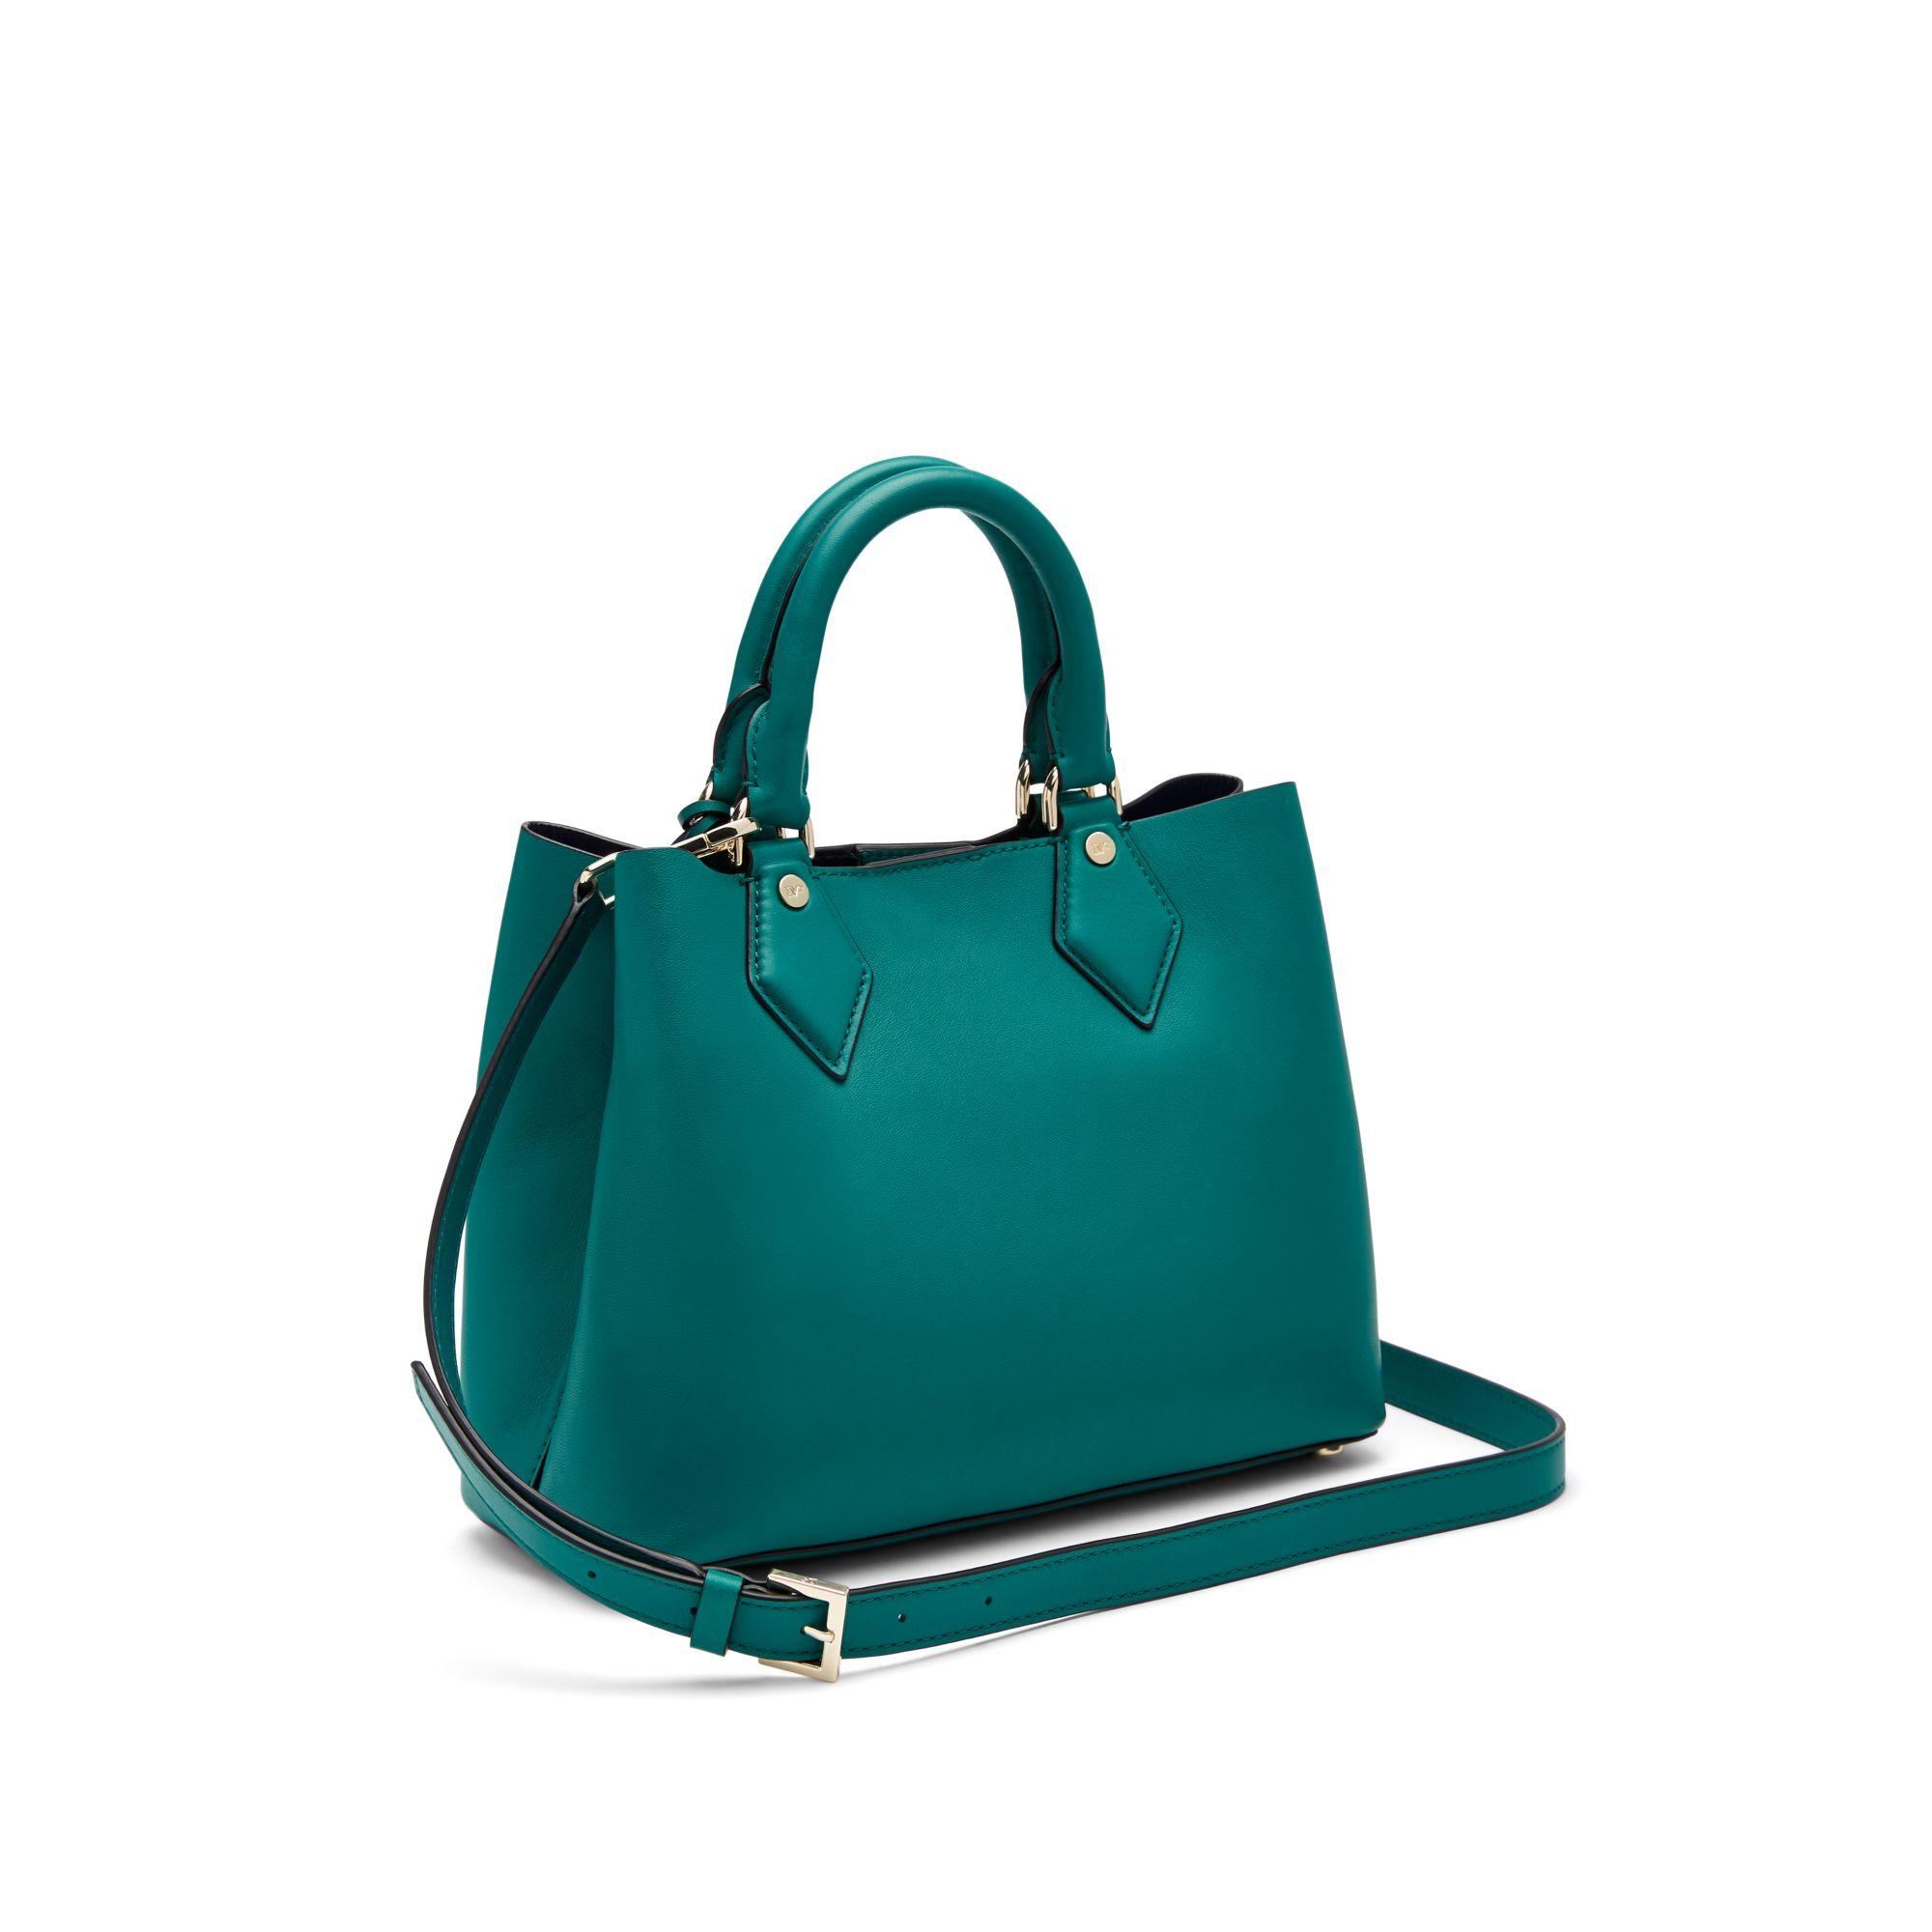 12b1503f80a01 Lyst - Diane von Furstenberg Voyage Small Bonded Leather Carryall ...